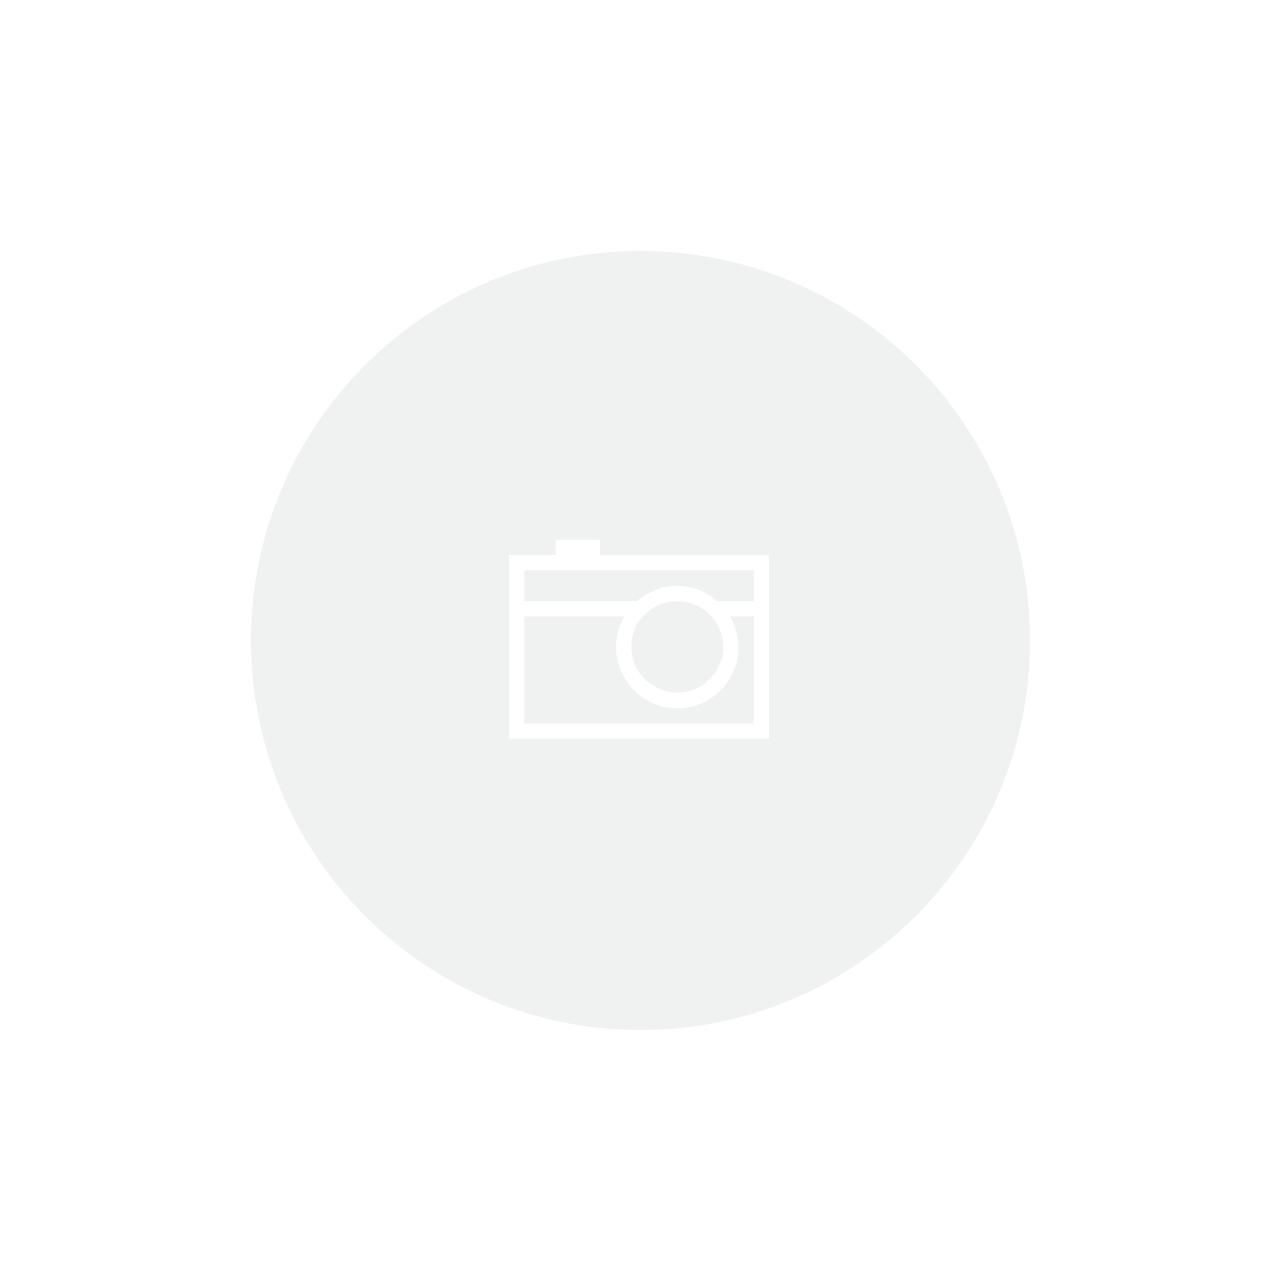 Papel Artesanal Indiano - Ref. 23